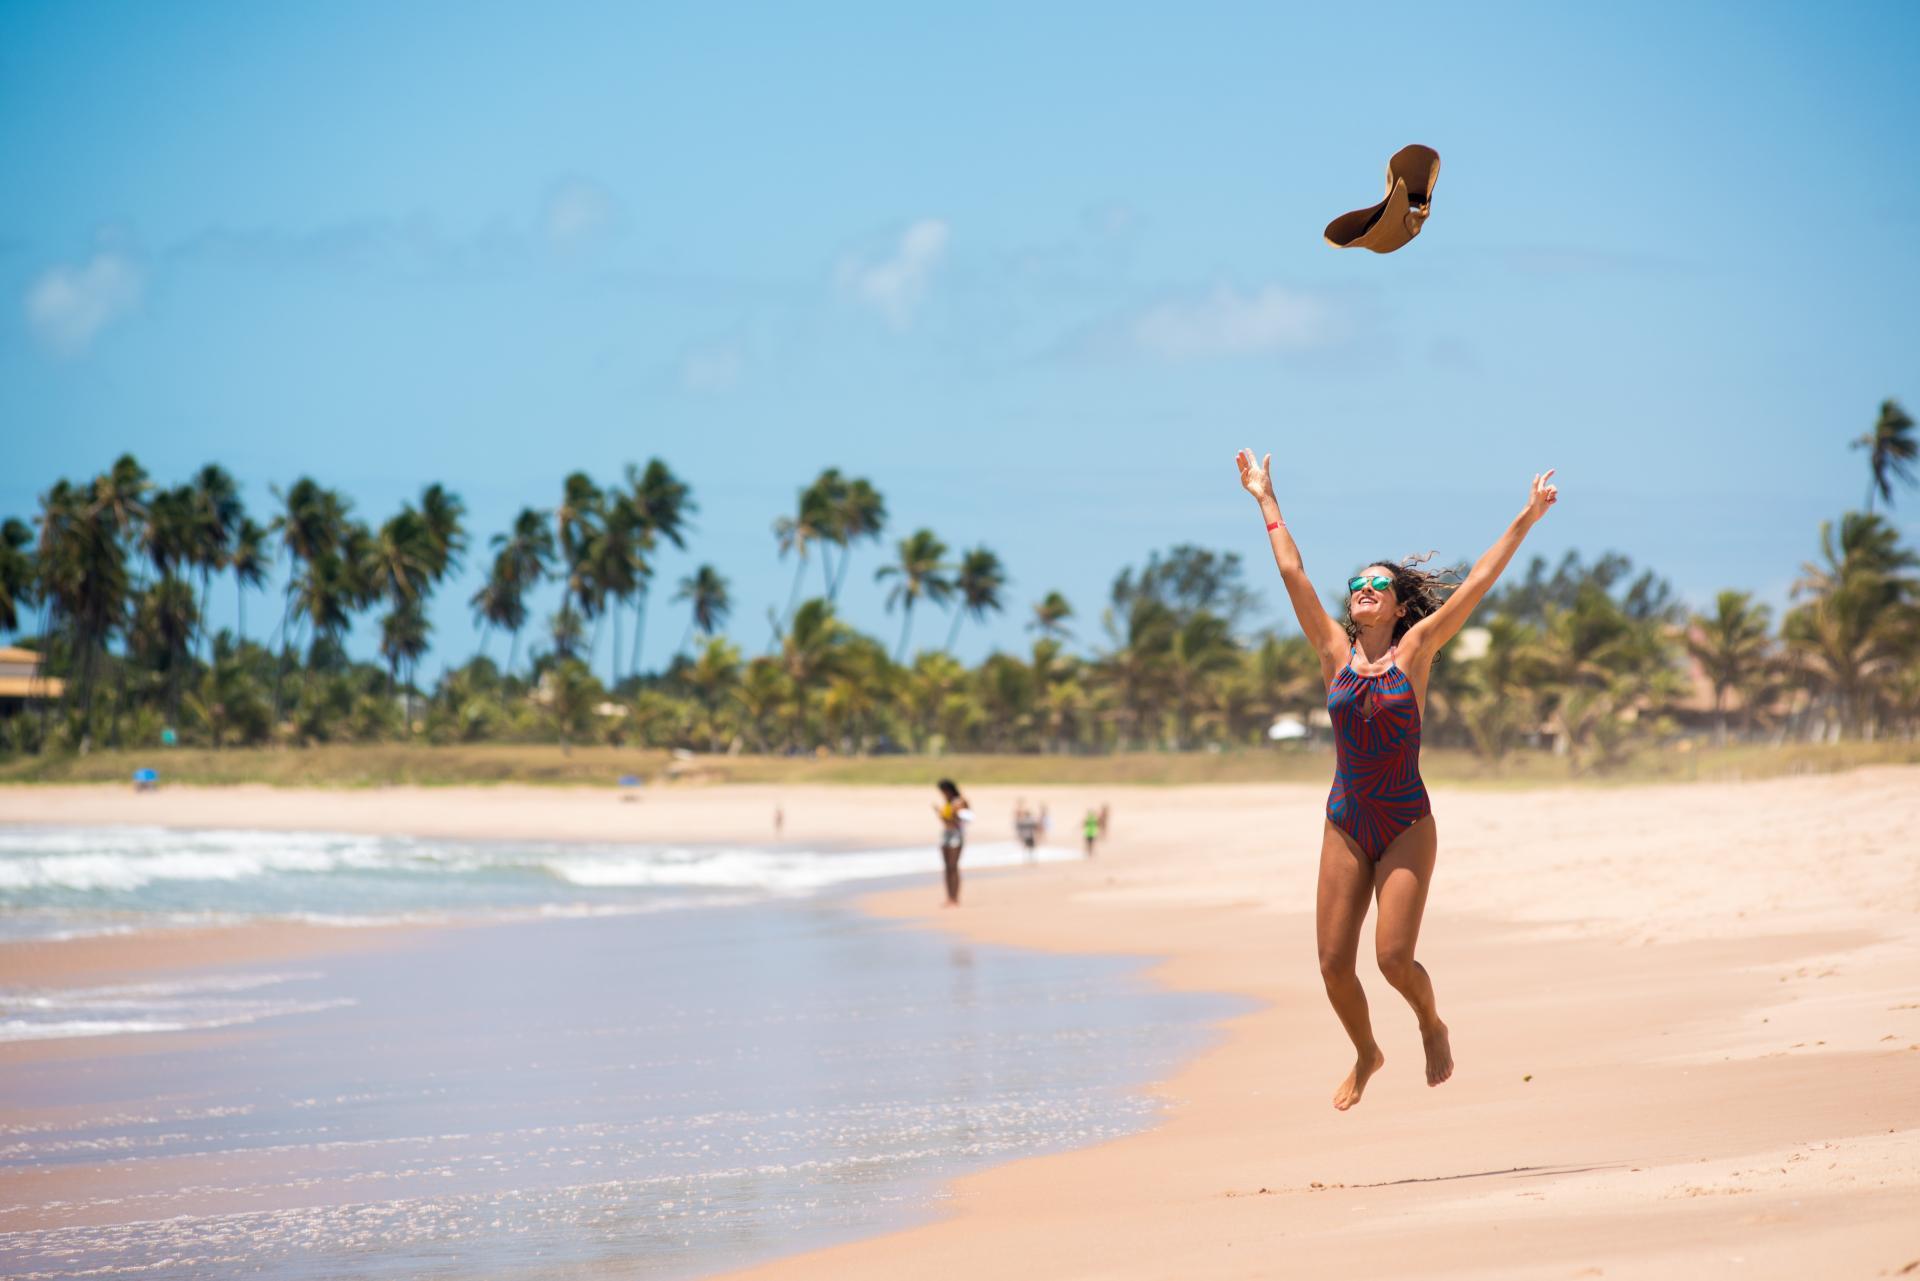 A vacationer takes a joyful leap at Guarajuba beach.